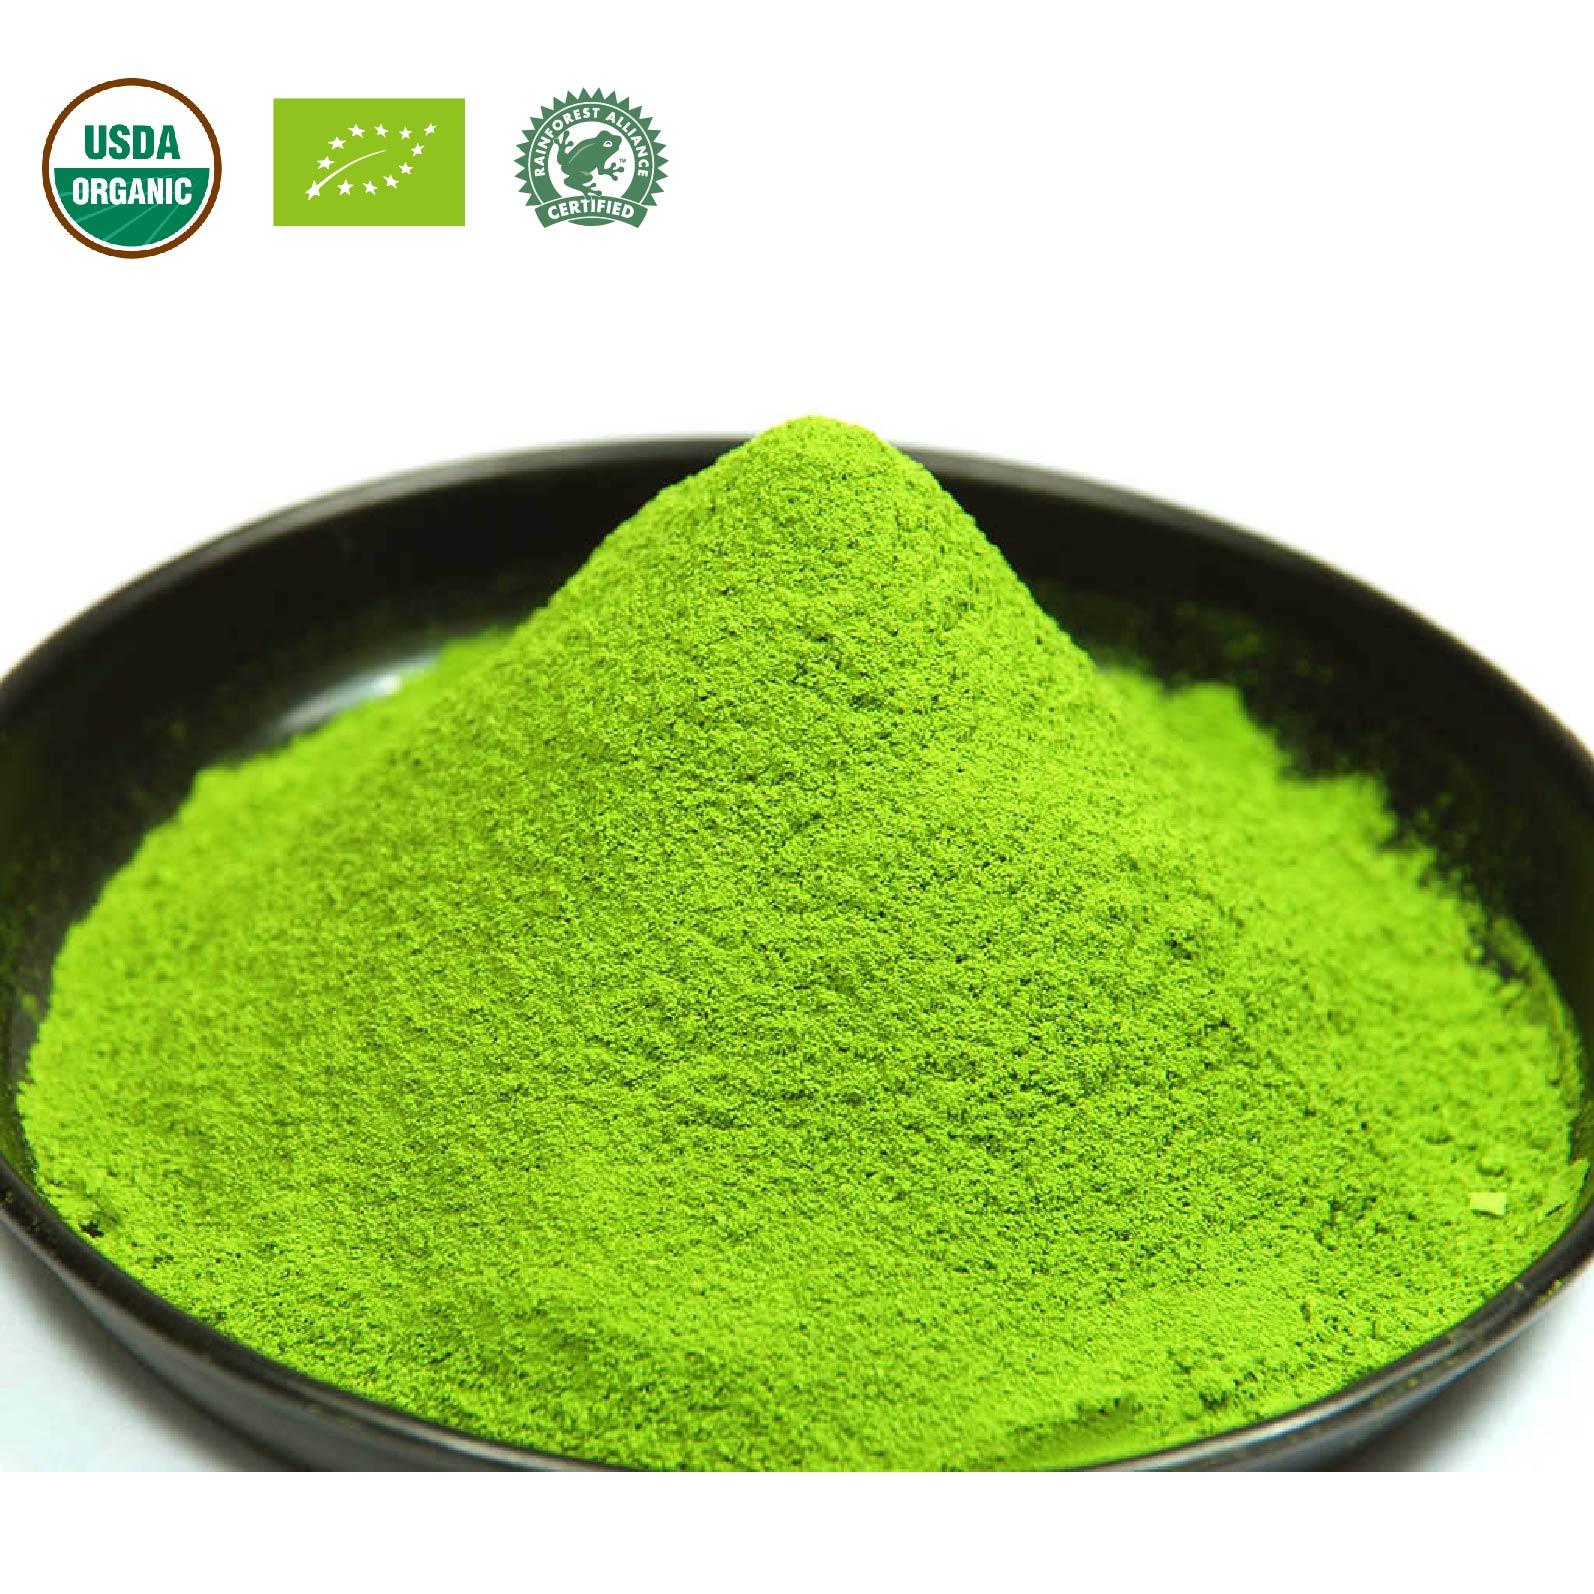 OEM Natural Organic Matcha Green Tea Powder for wholesale - 4uTea   4uTea.com